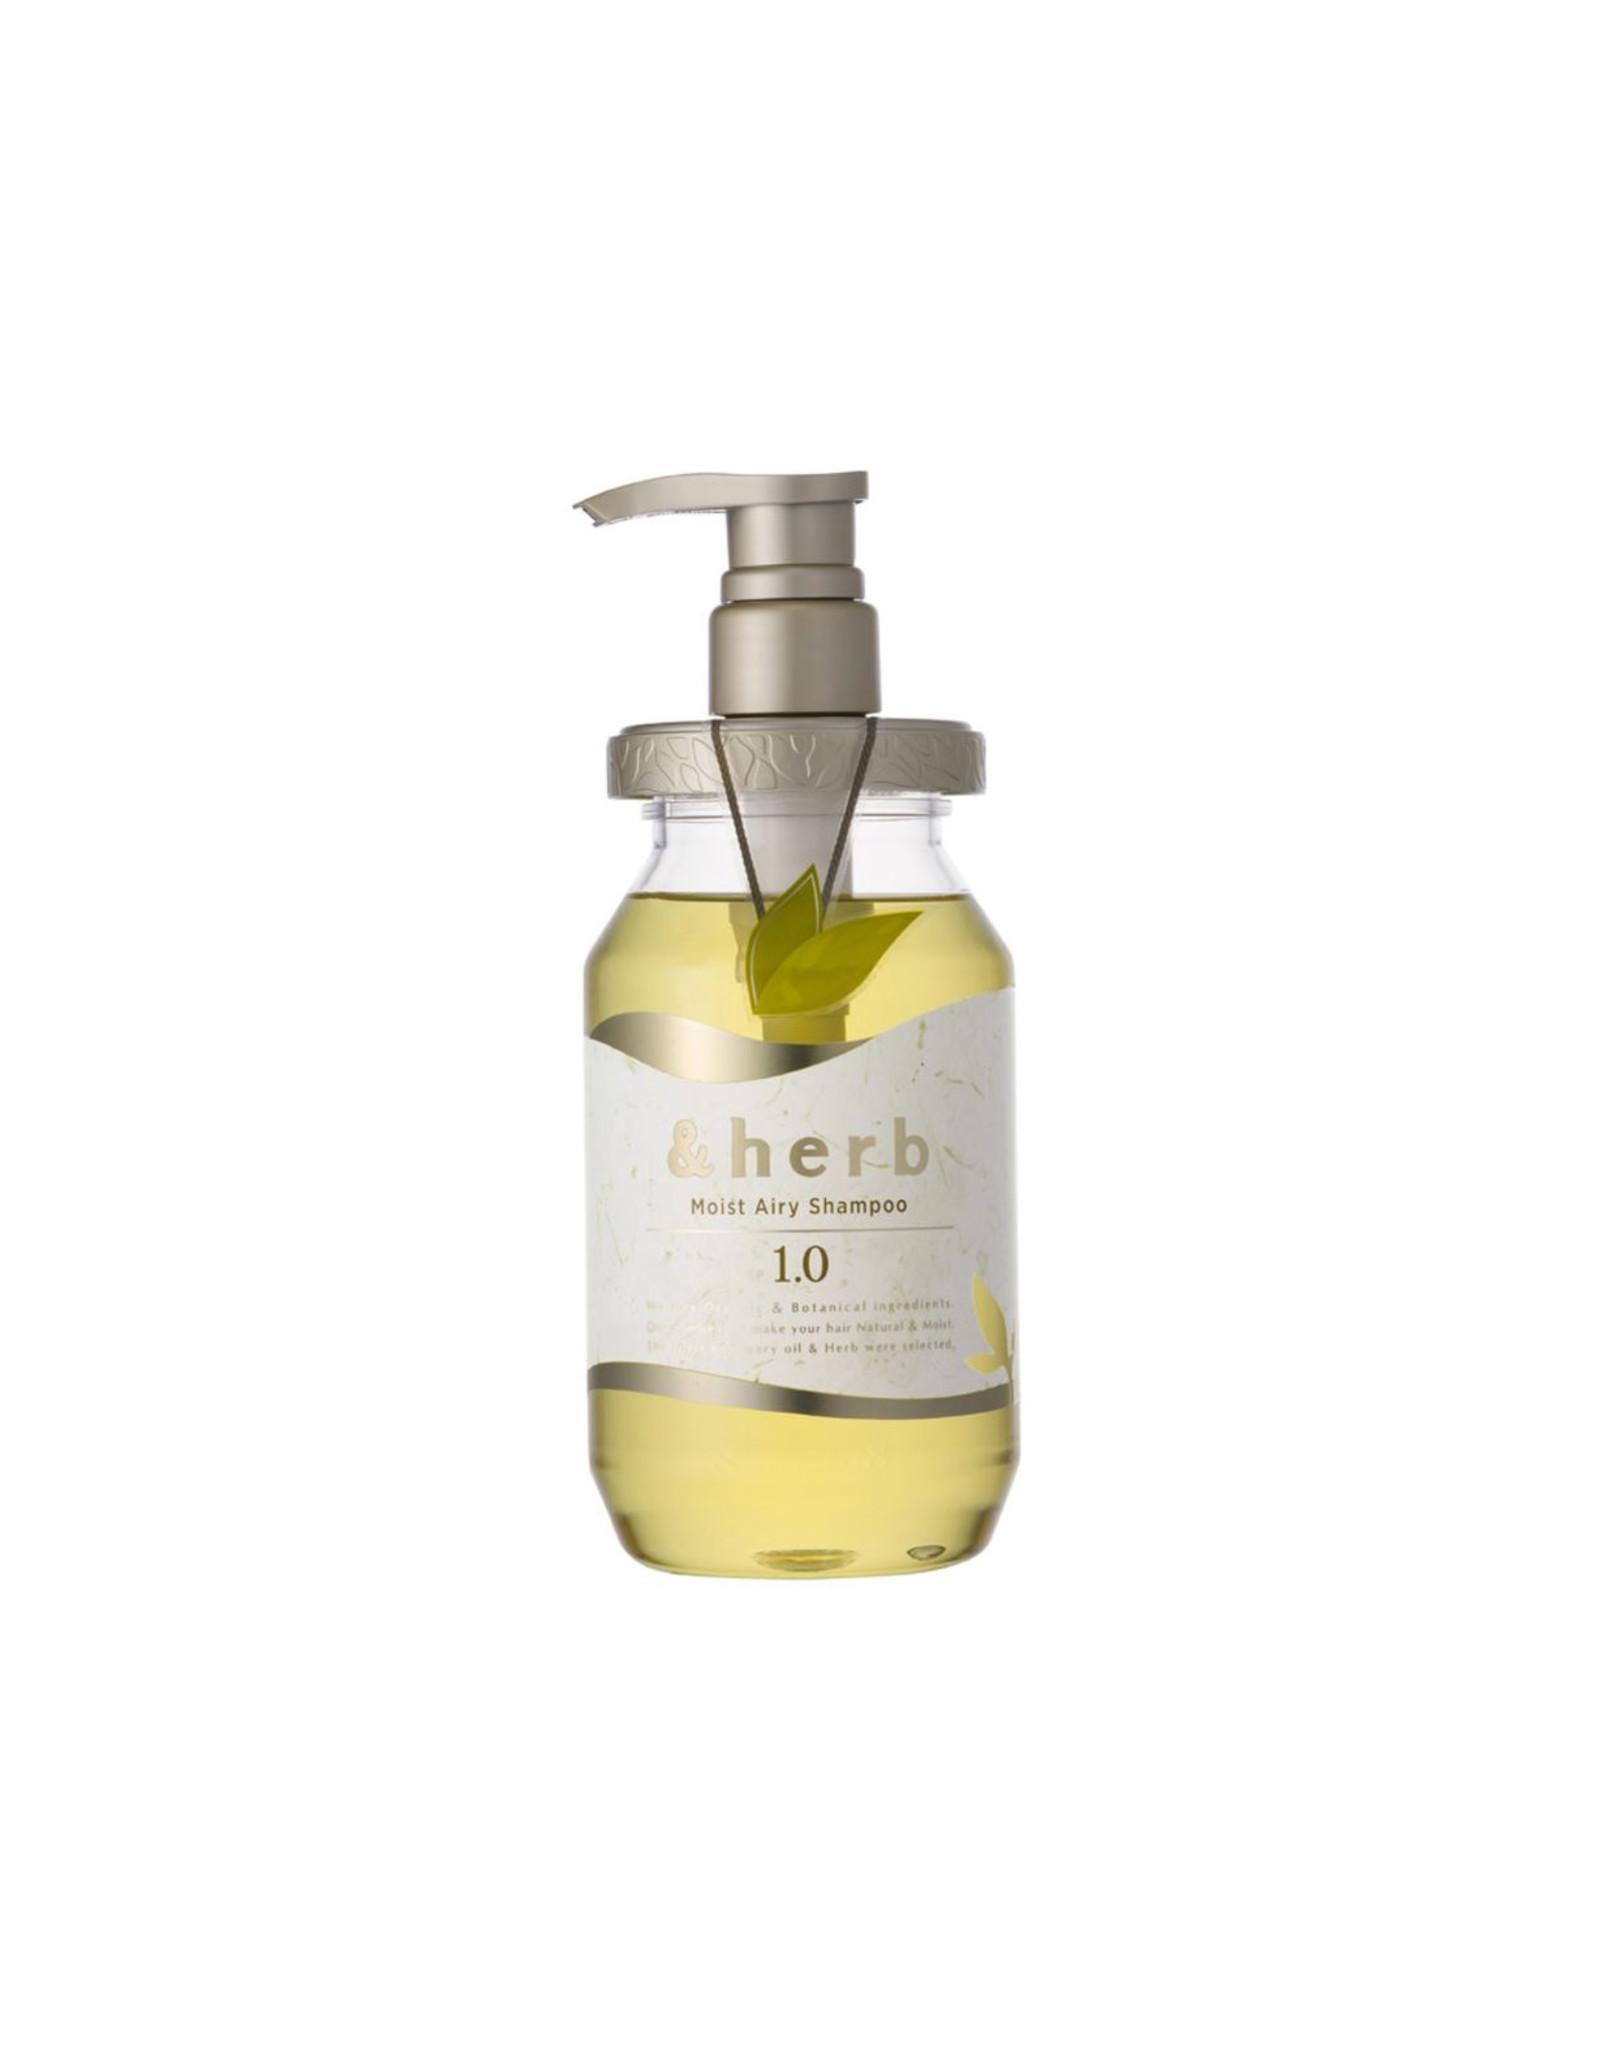 Vicrea Herb Moist Airy Shampoo 1.0 480ml